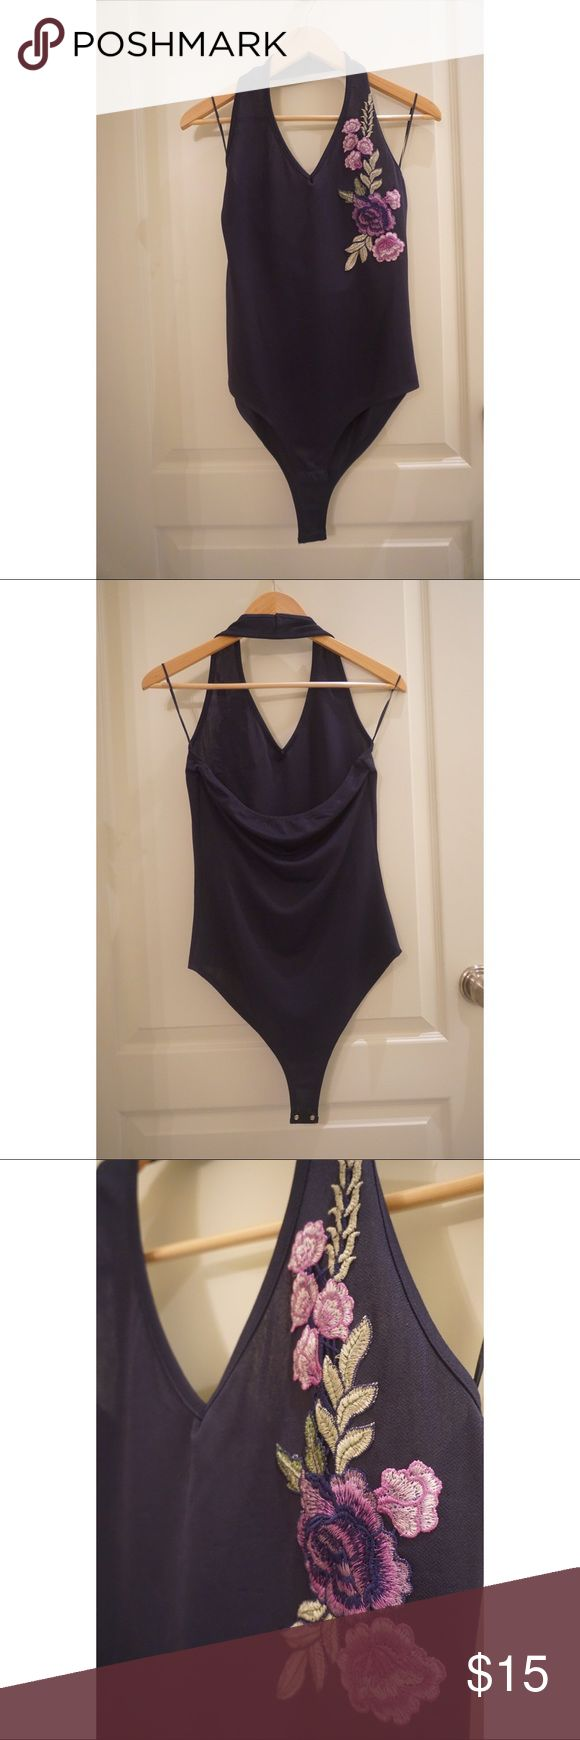 Halter Bodysuit Brand new halter bodysuit with embroidered design. Tops